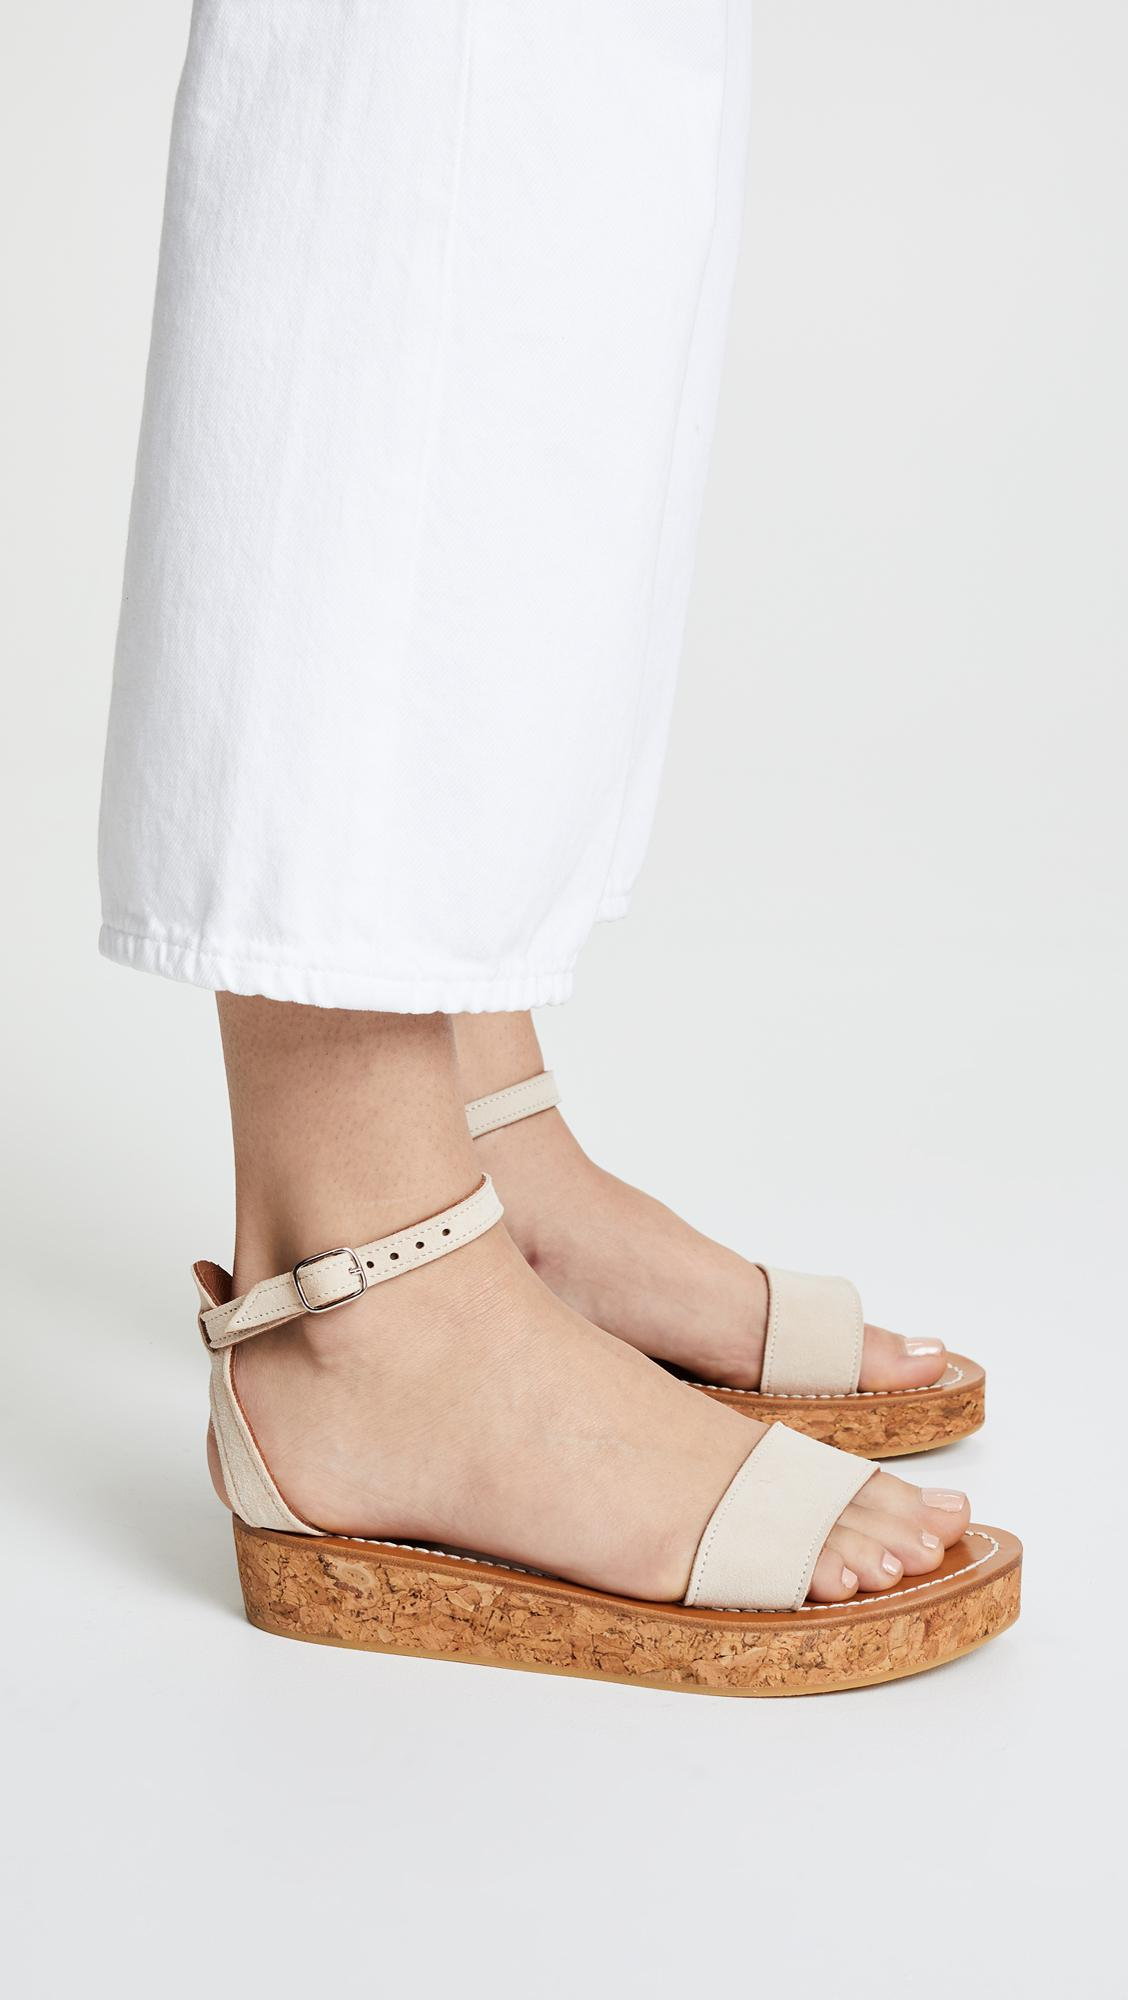 6342f038bd6 Lyst - K. Jacques Talloire Flatform Sandals